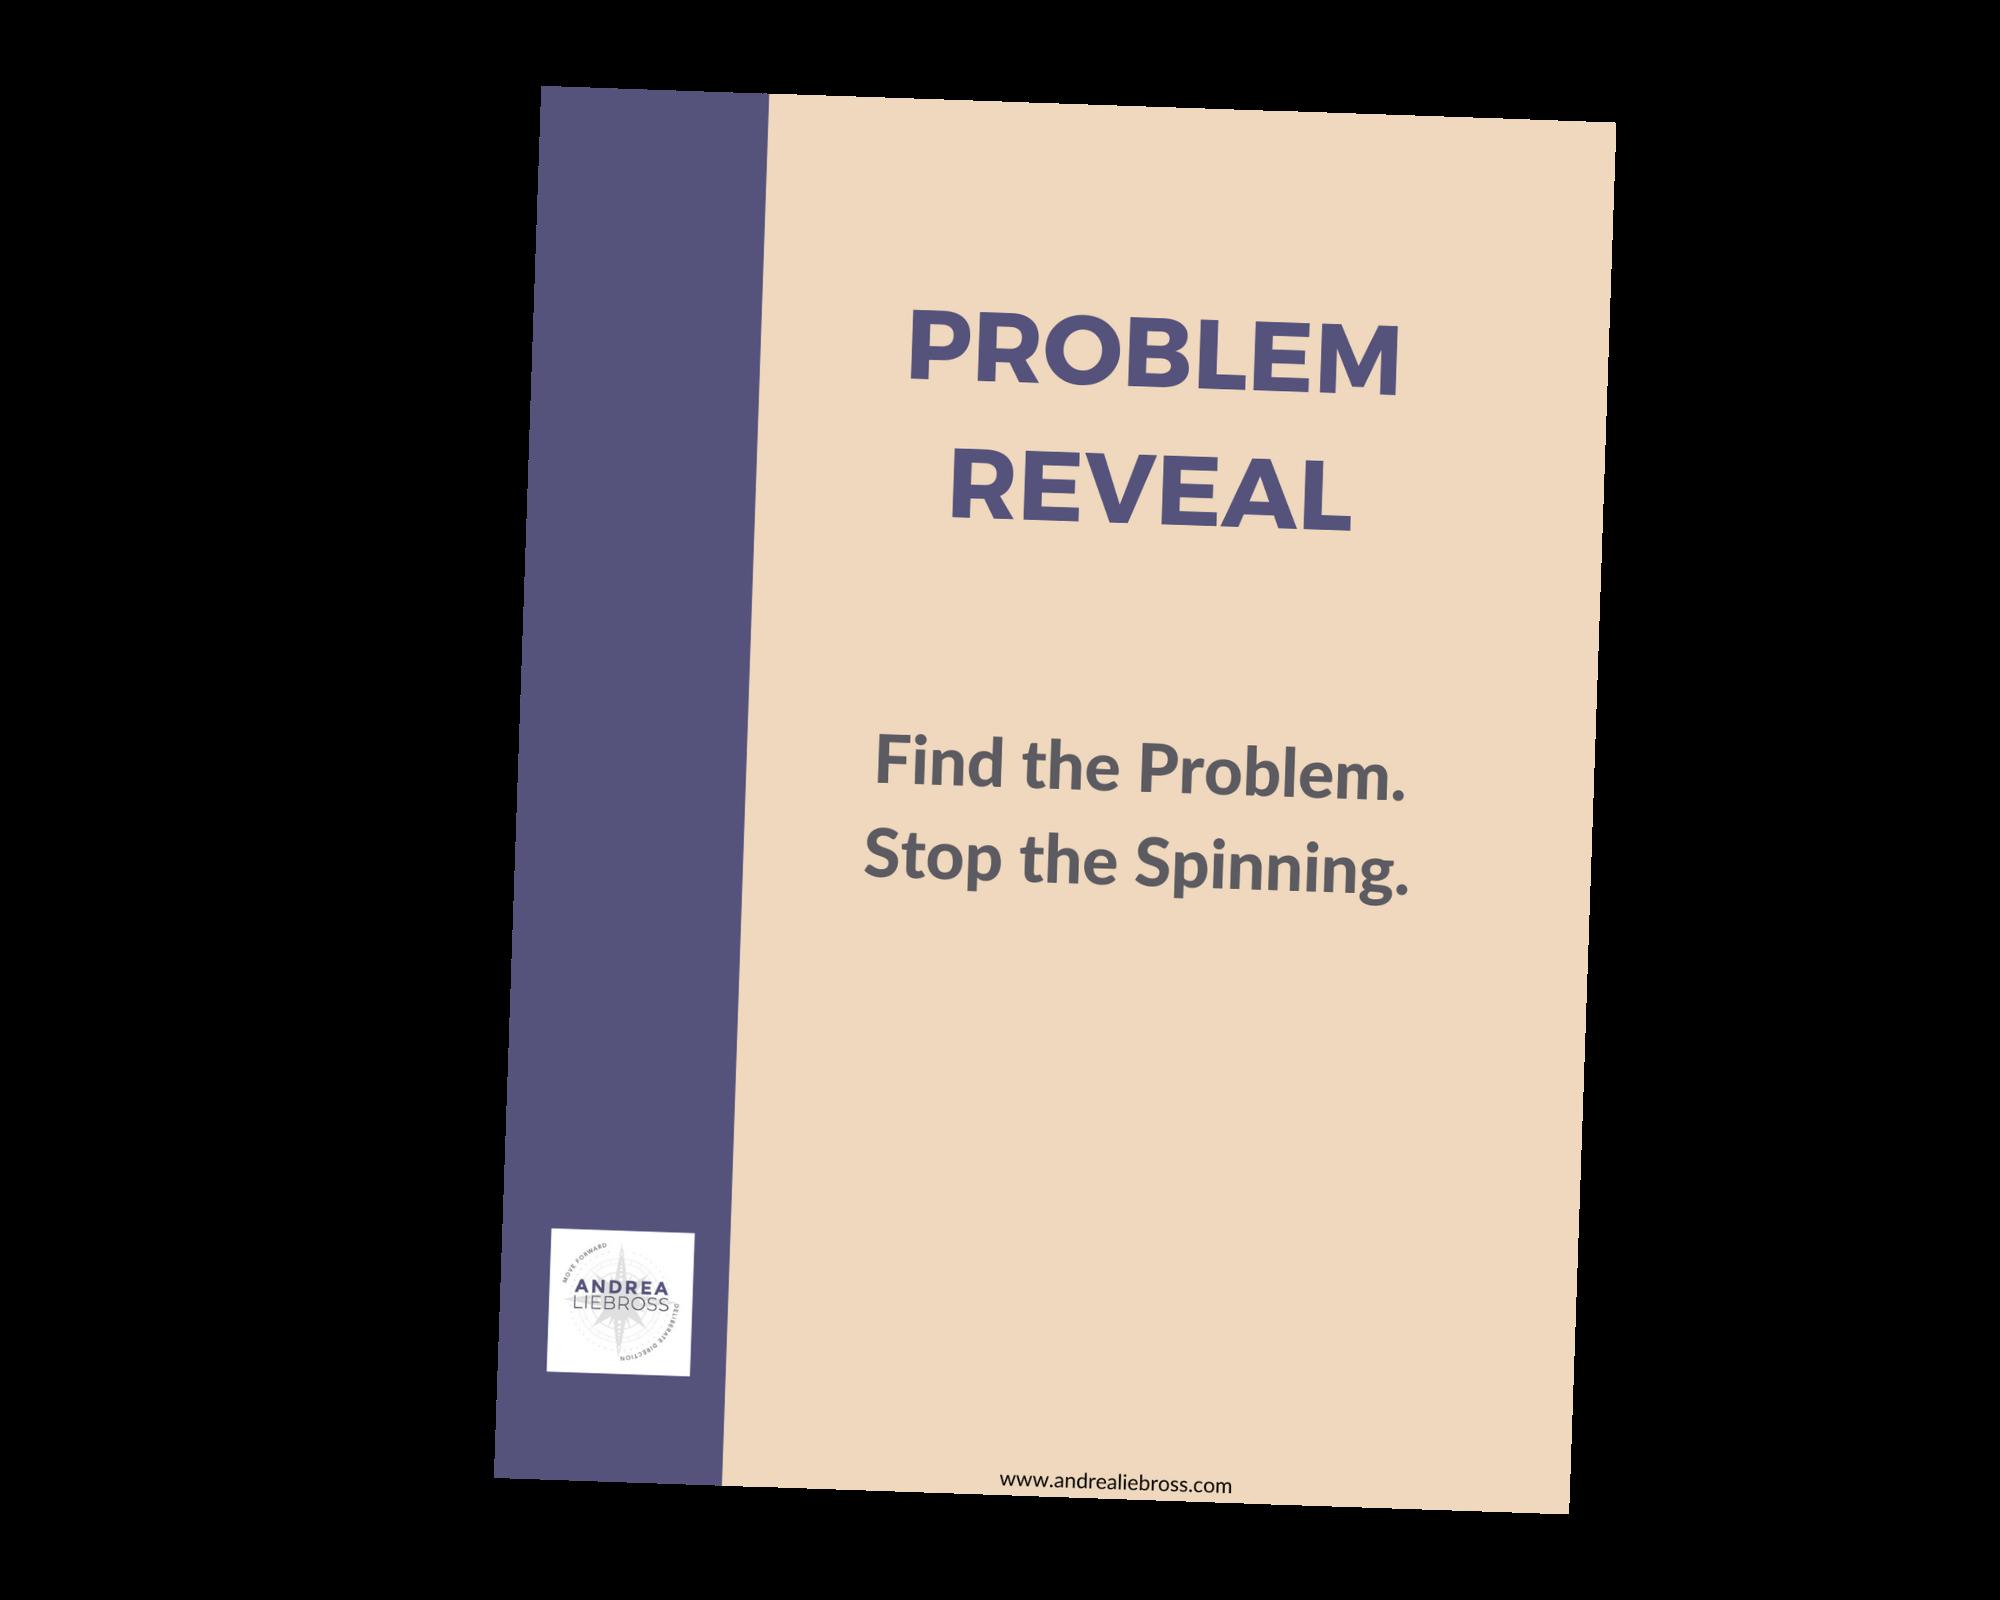 problem reveal cover